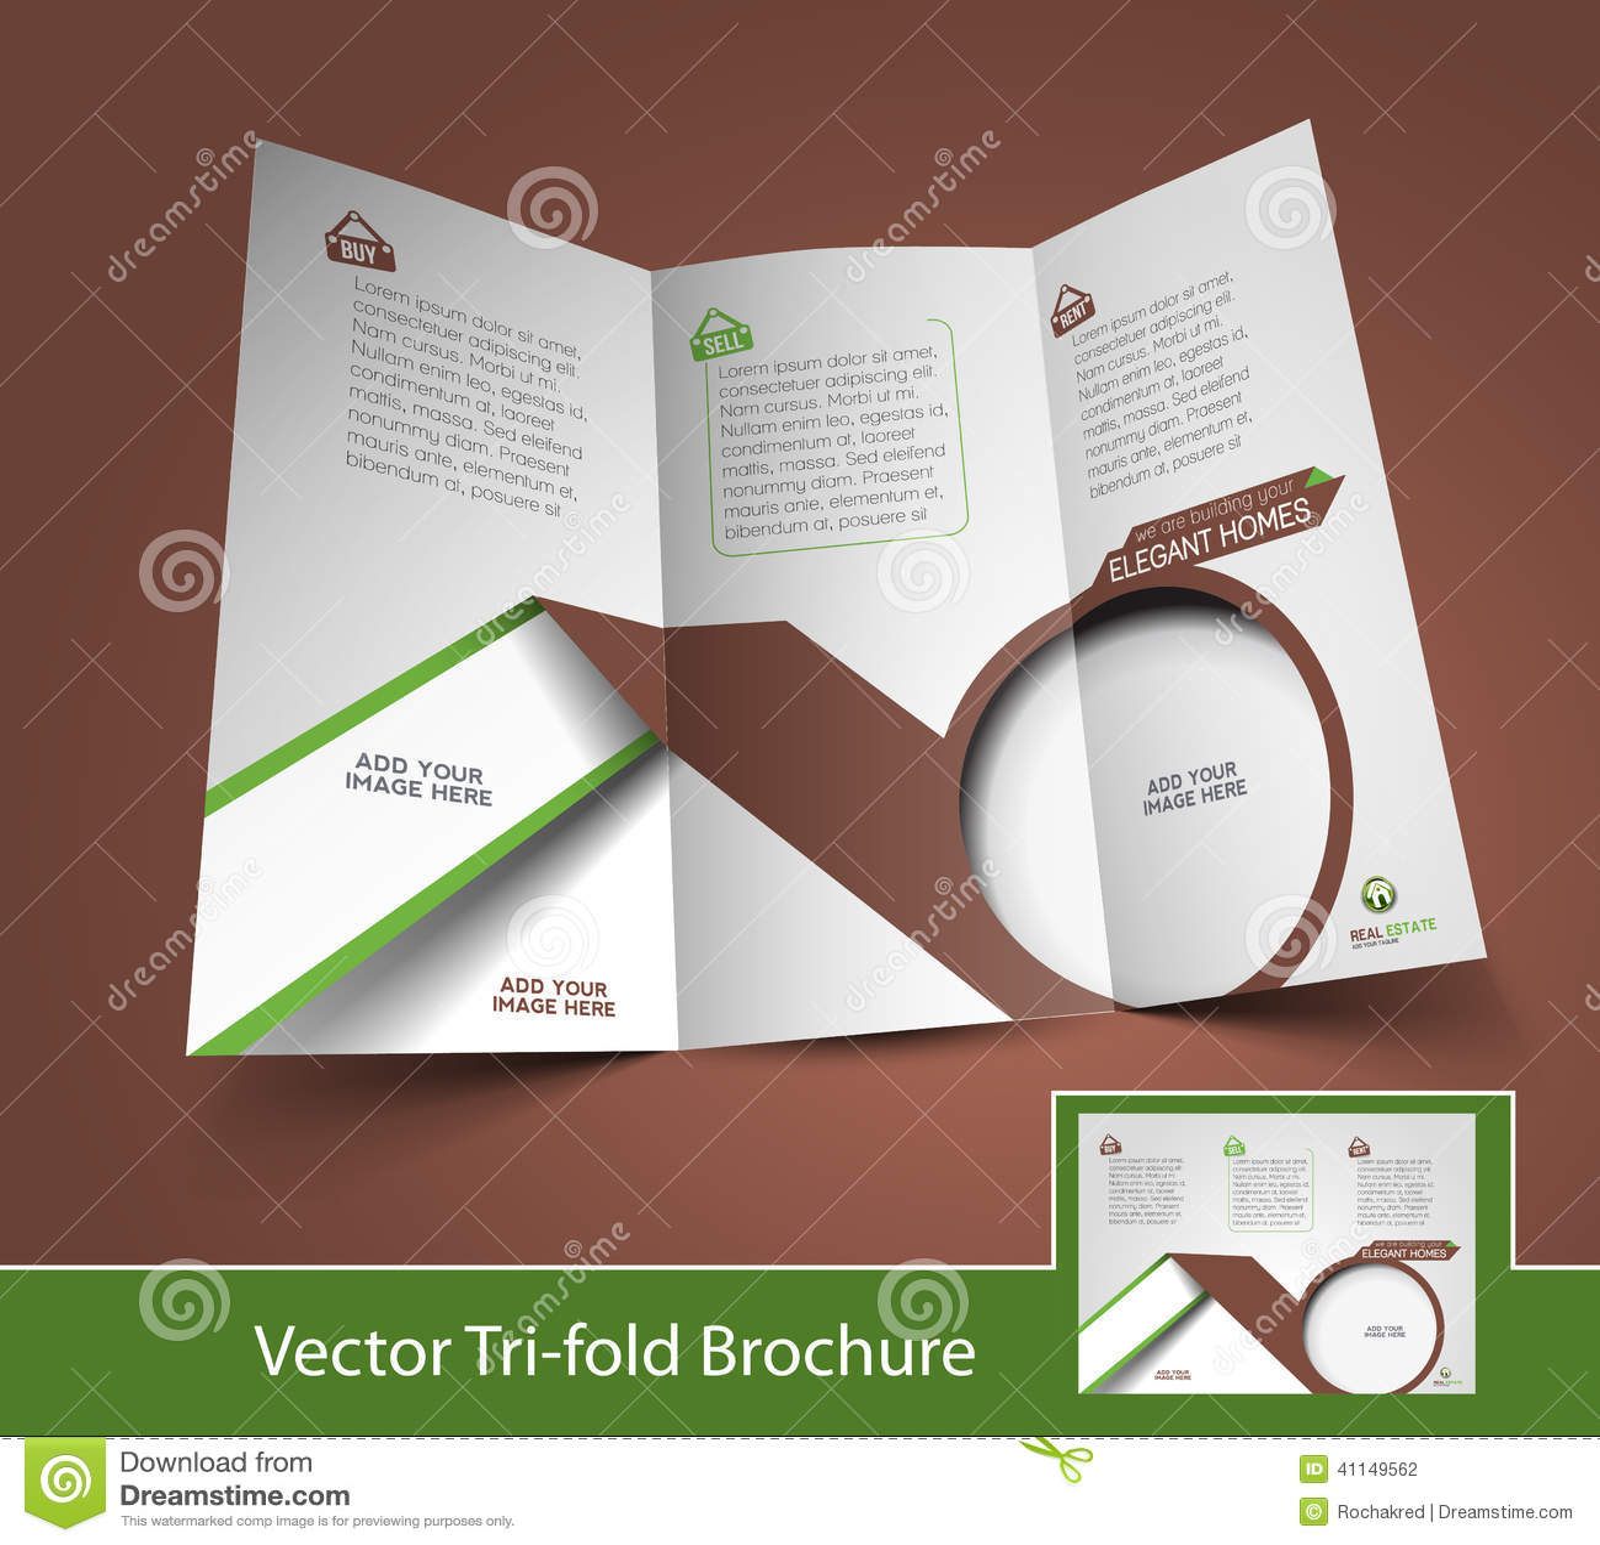 real estate tri fold brochure stock vector illustration of